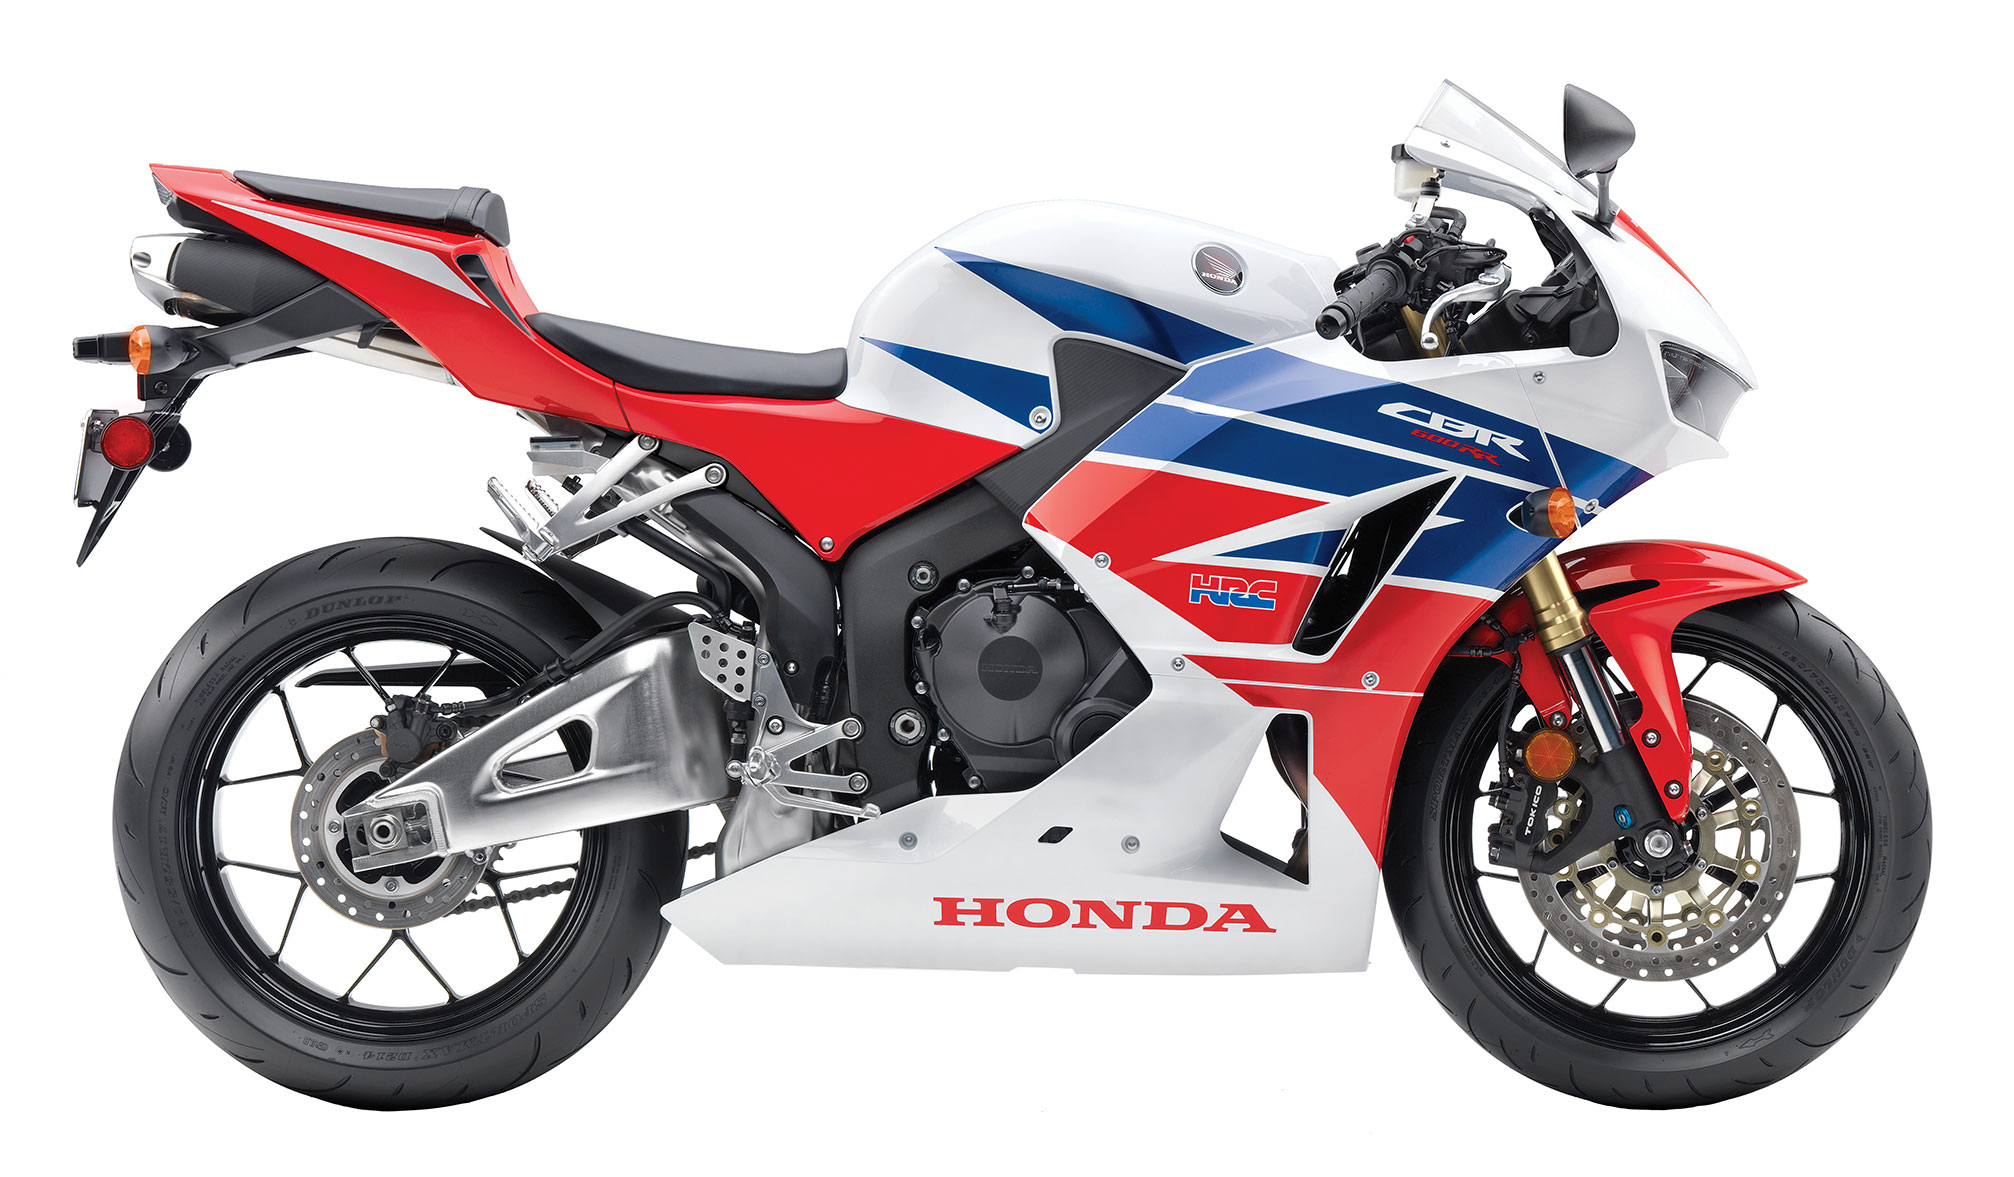 ECU Flashing for Honda 2013-2015 CBR600RR